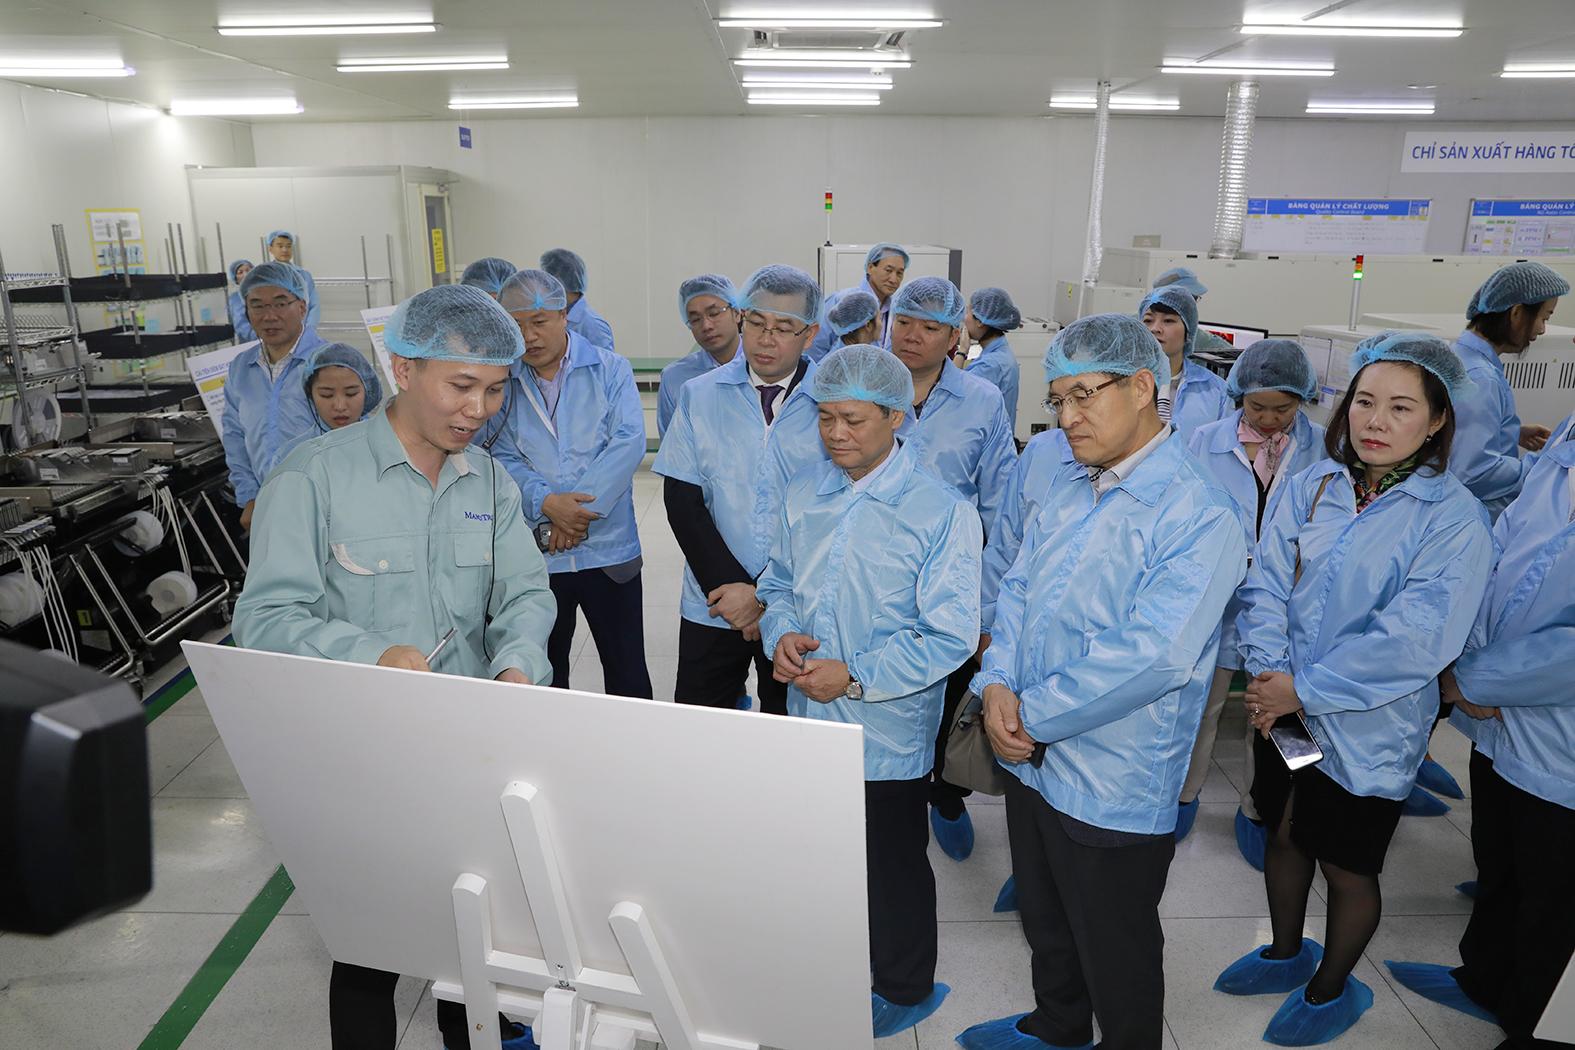 samsung elevates 29 vietnamese vendors to tier 1 supply chain